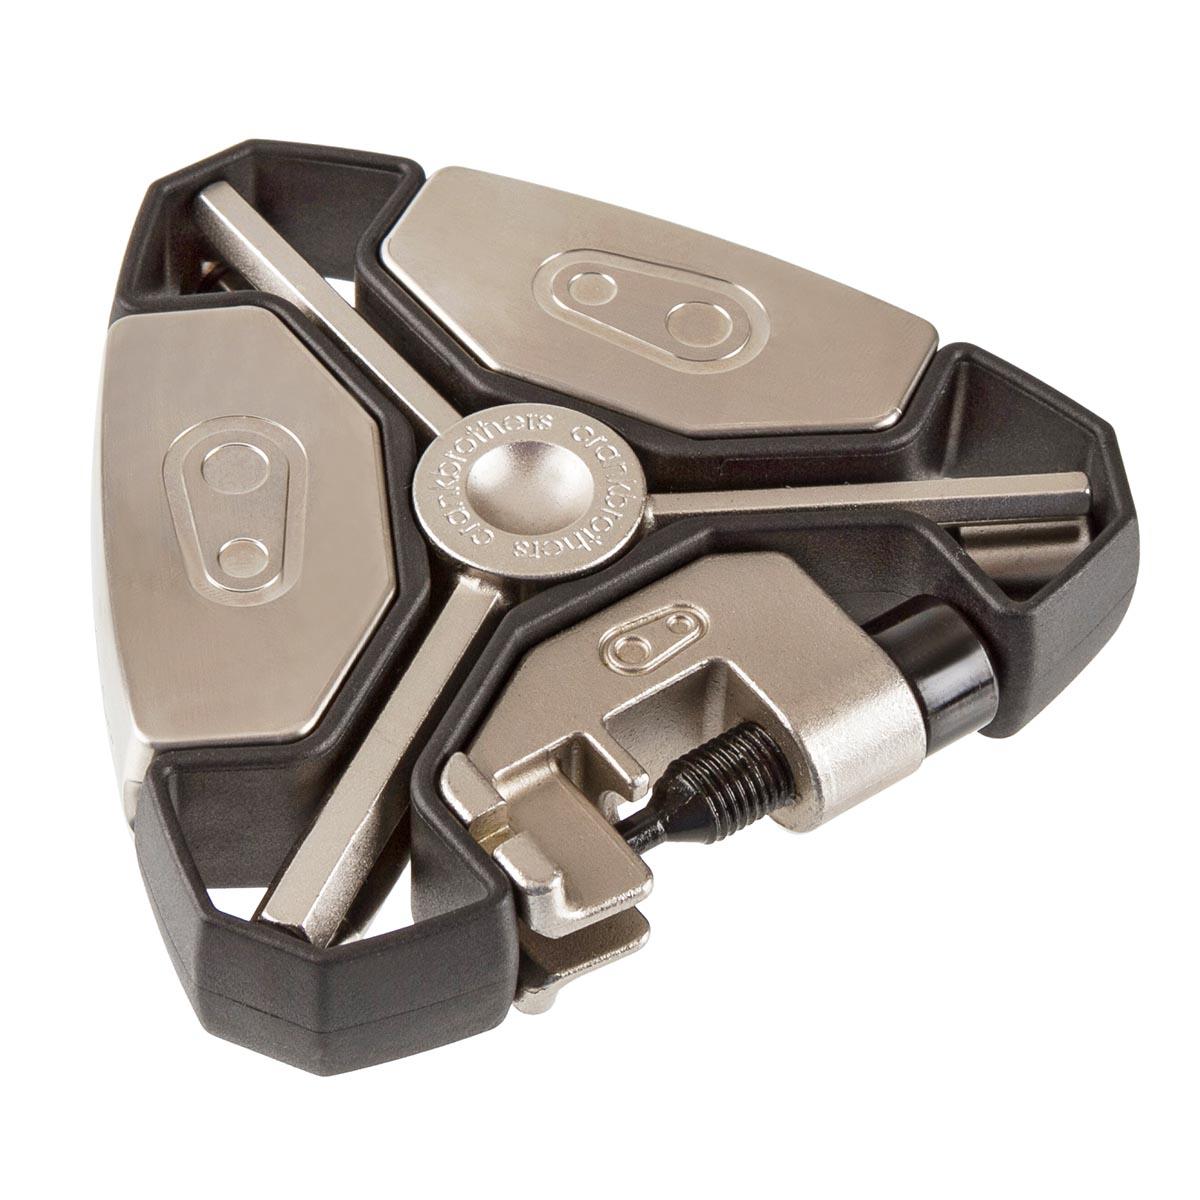 Crankbrothers Multi-Tool Y-15 Schwarz/Silber